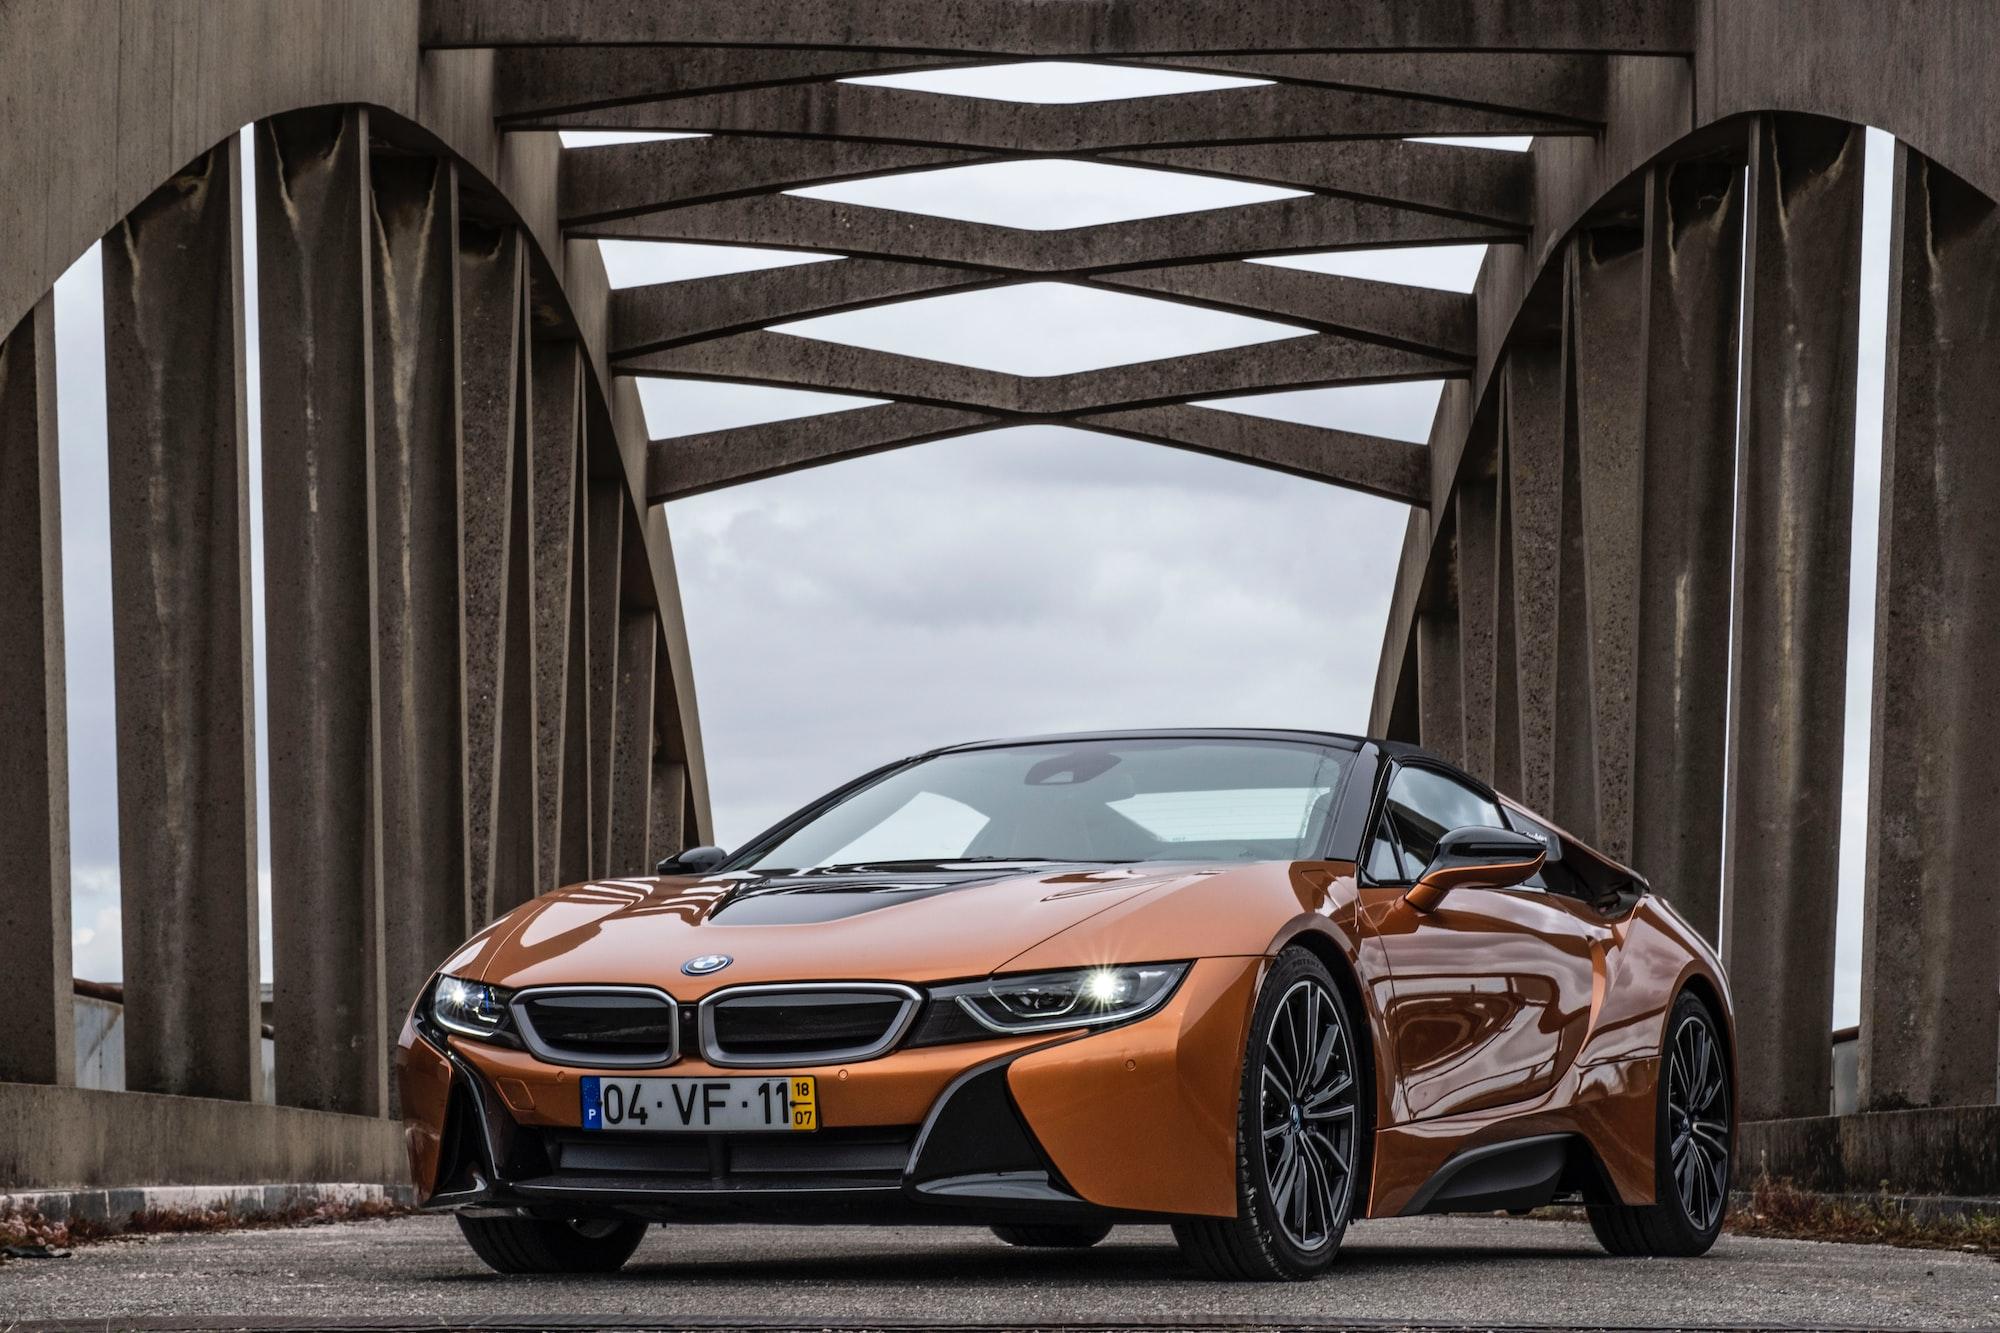 BMW Orders Batteries Worth $24 Billion Amid Increasing EV Demand